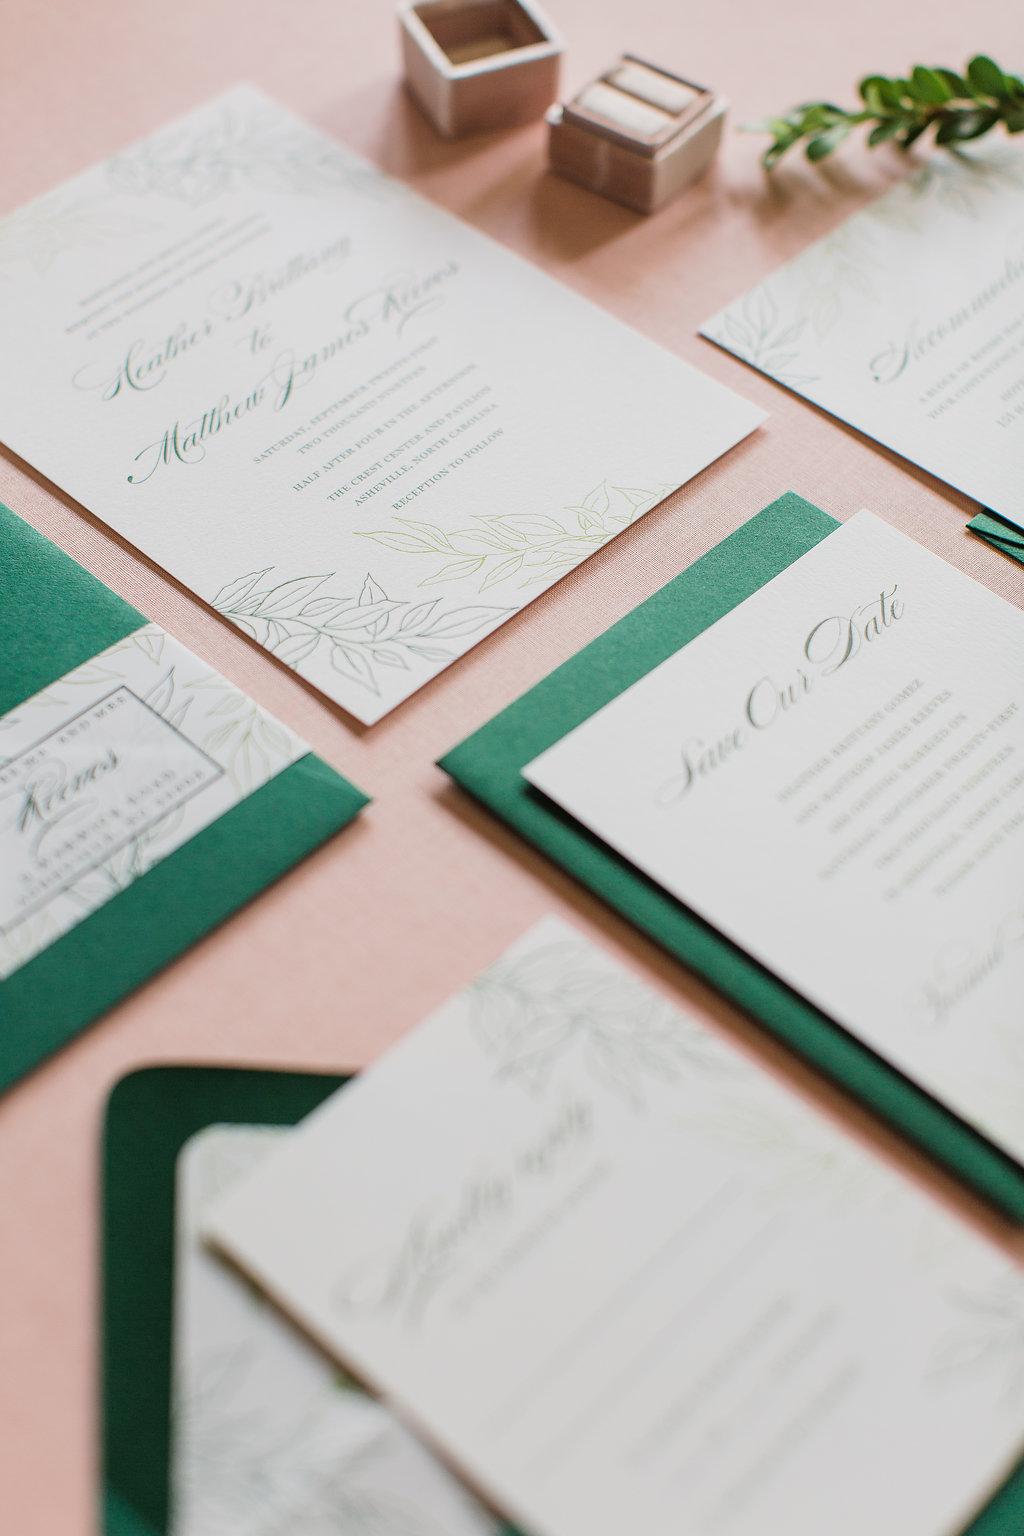 Heather Hand Drawn Wedding Invitation Greenery Feathered Heart PrintsFHP-32.jpg